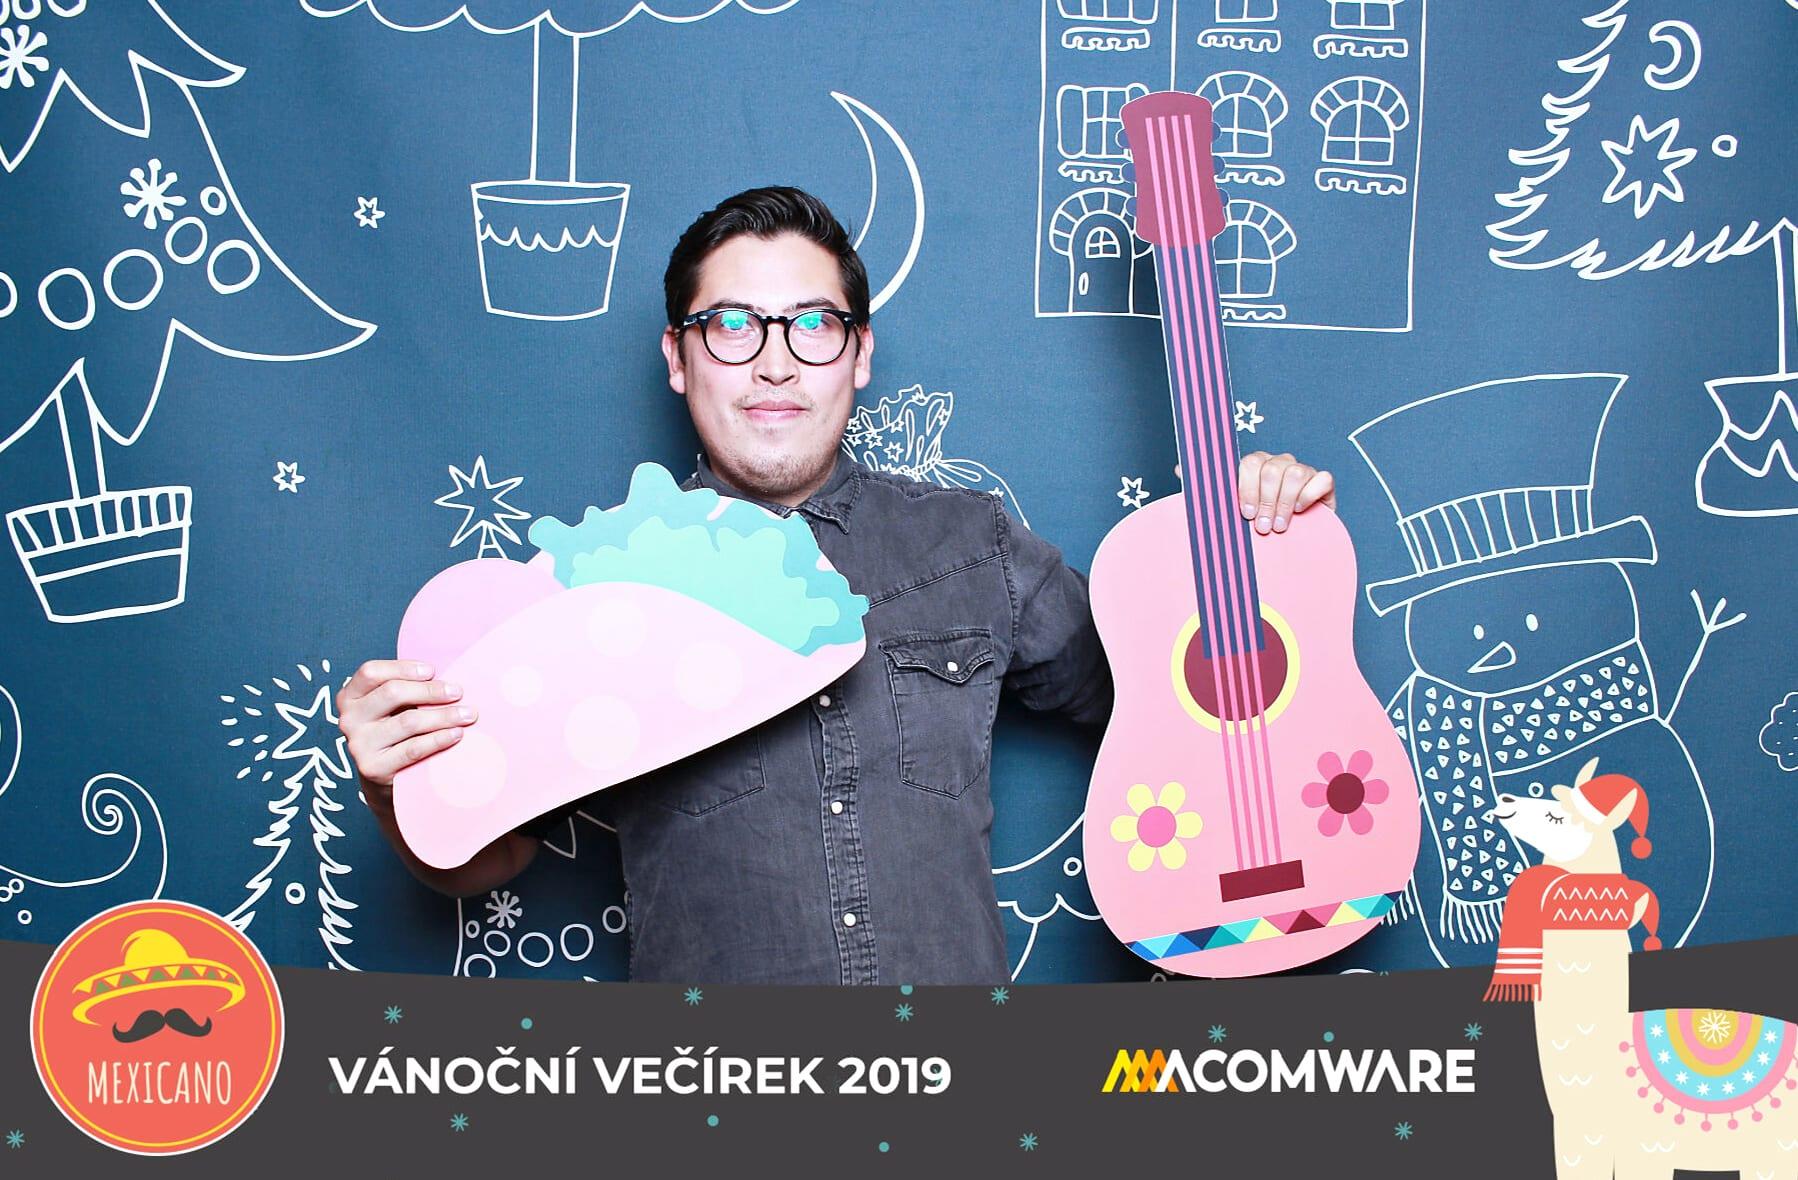 fotokoutek-firemni-vecirek-praha-vanocni-vecirek-acomware-13-12-2019-694301